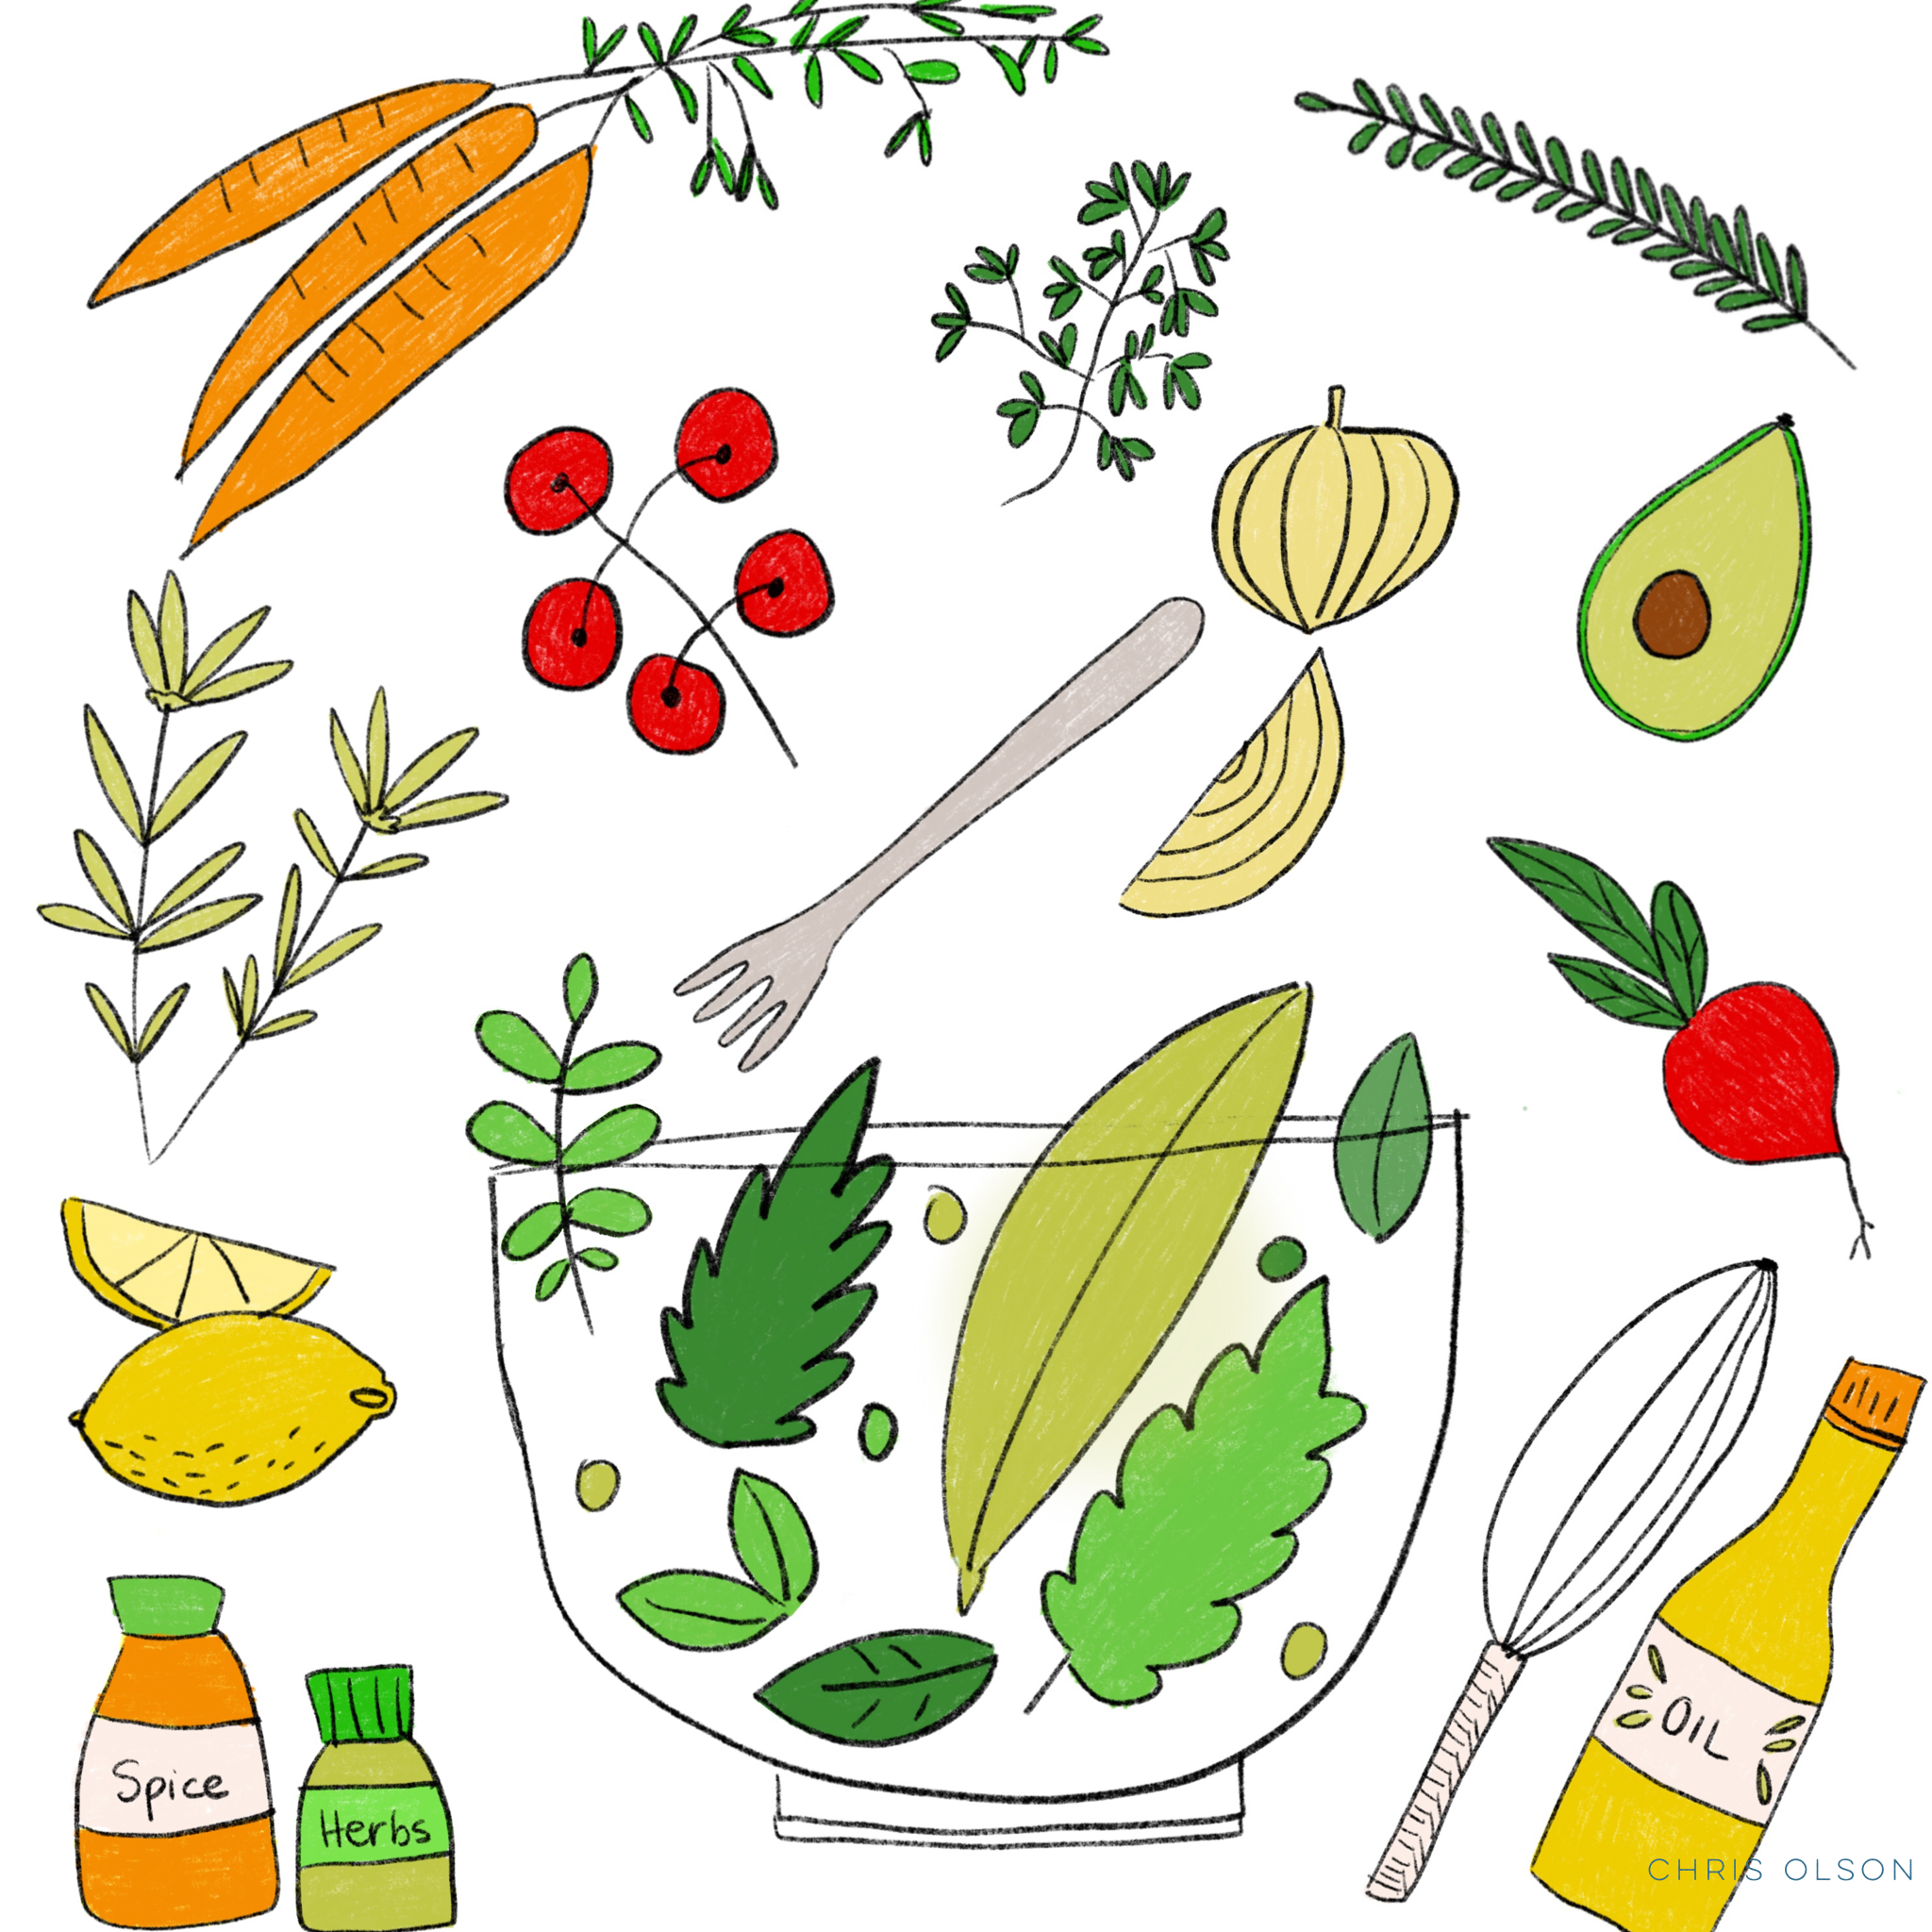 Salad art by Chris Olson